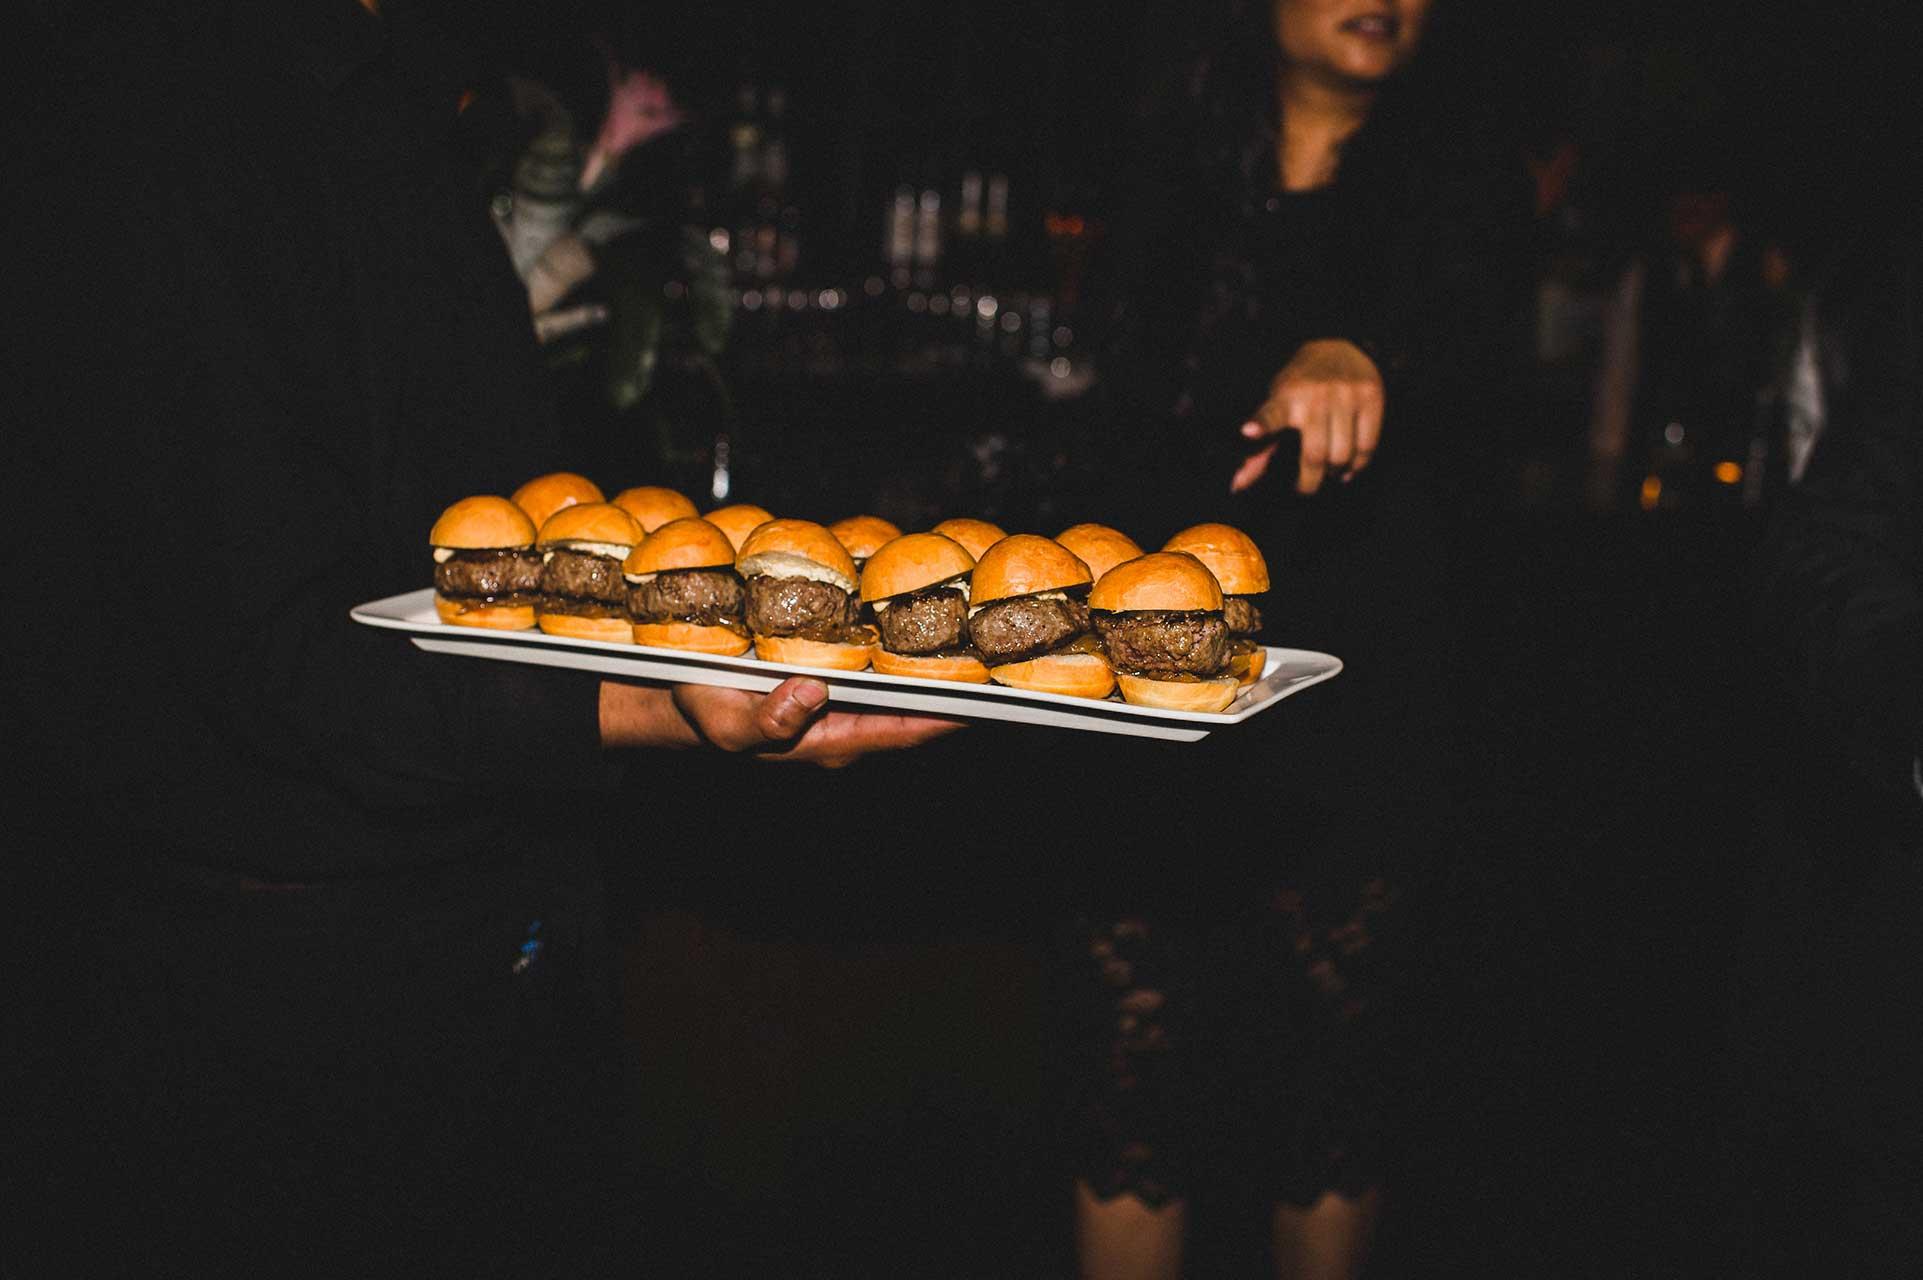 Wedding Catering Toronto - Late Night Snacks - Sliders